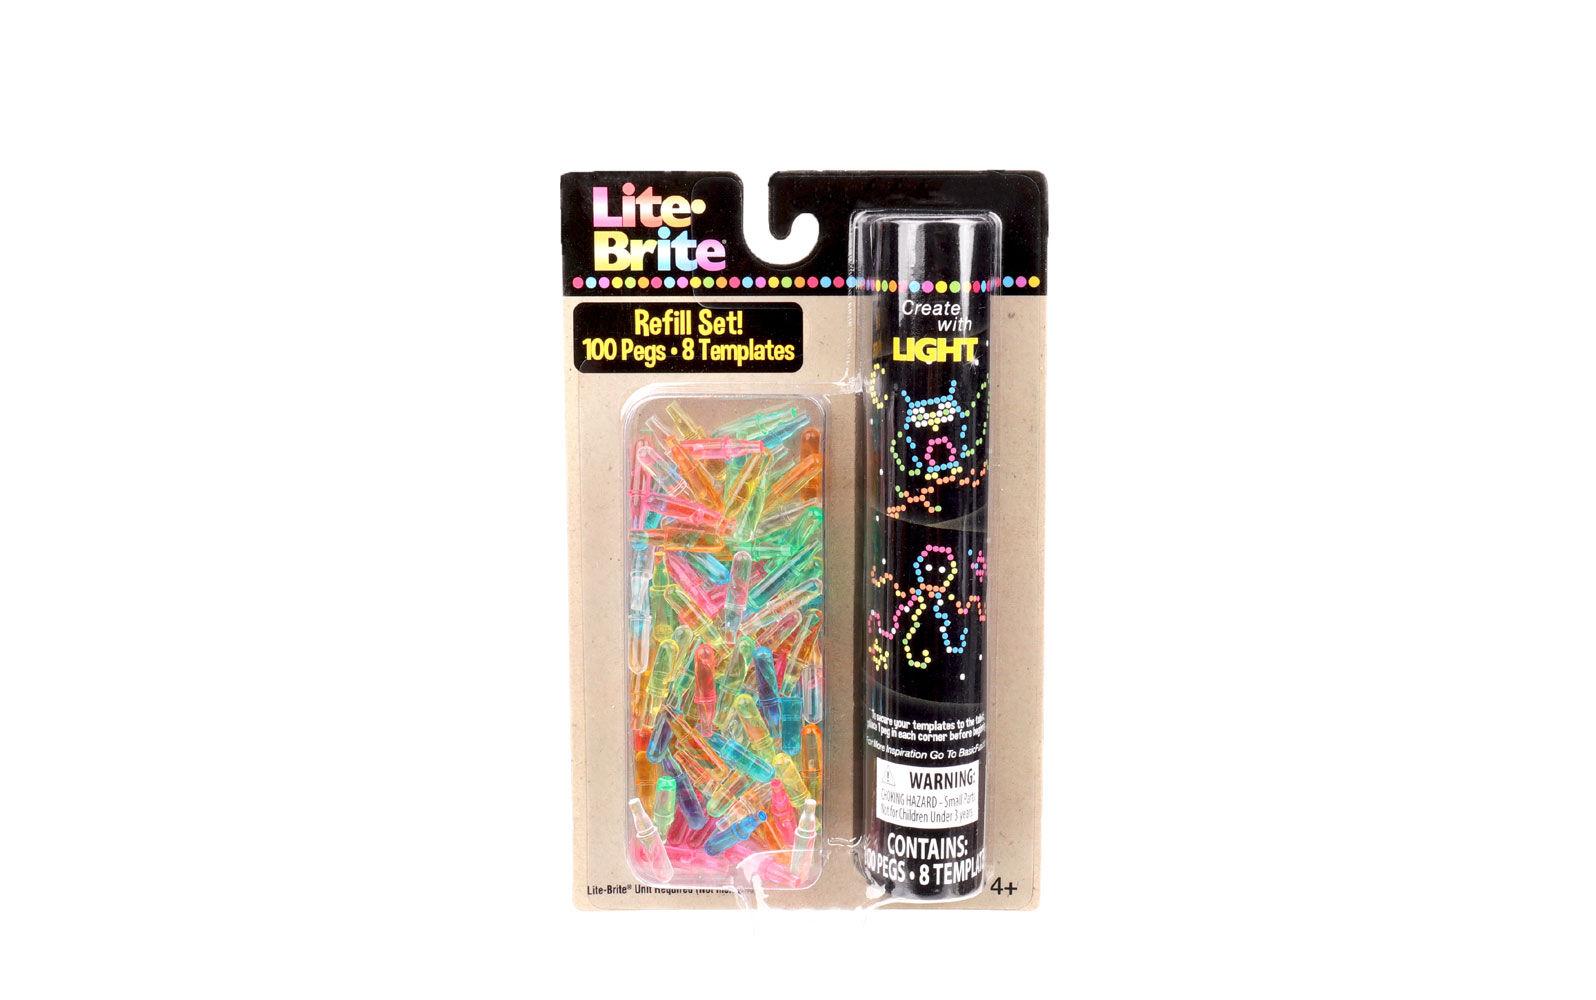 photograph regarding Printable Lite Brite Templates referred to as Lite-Brite Refill Pack